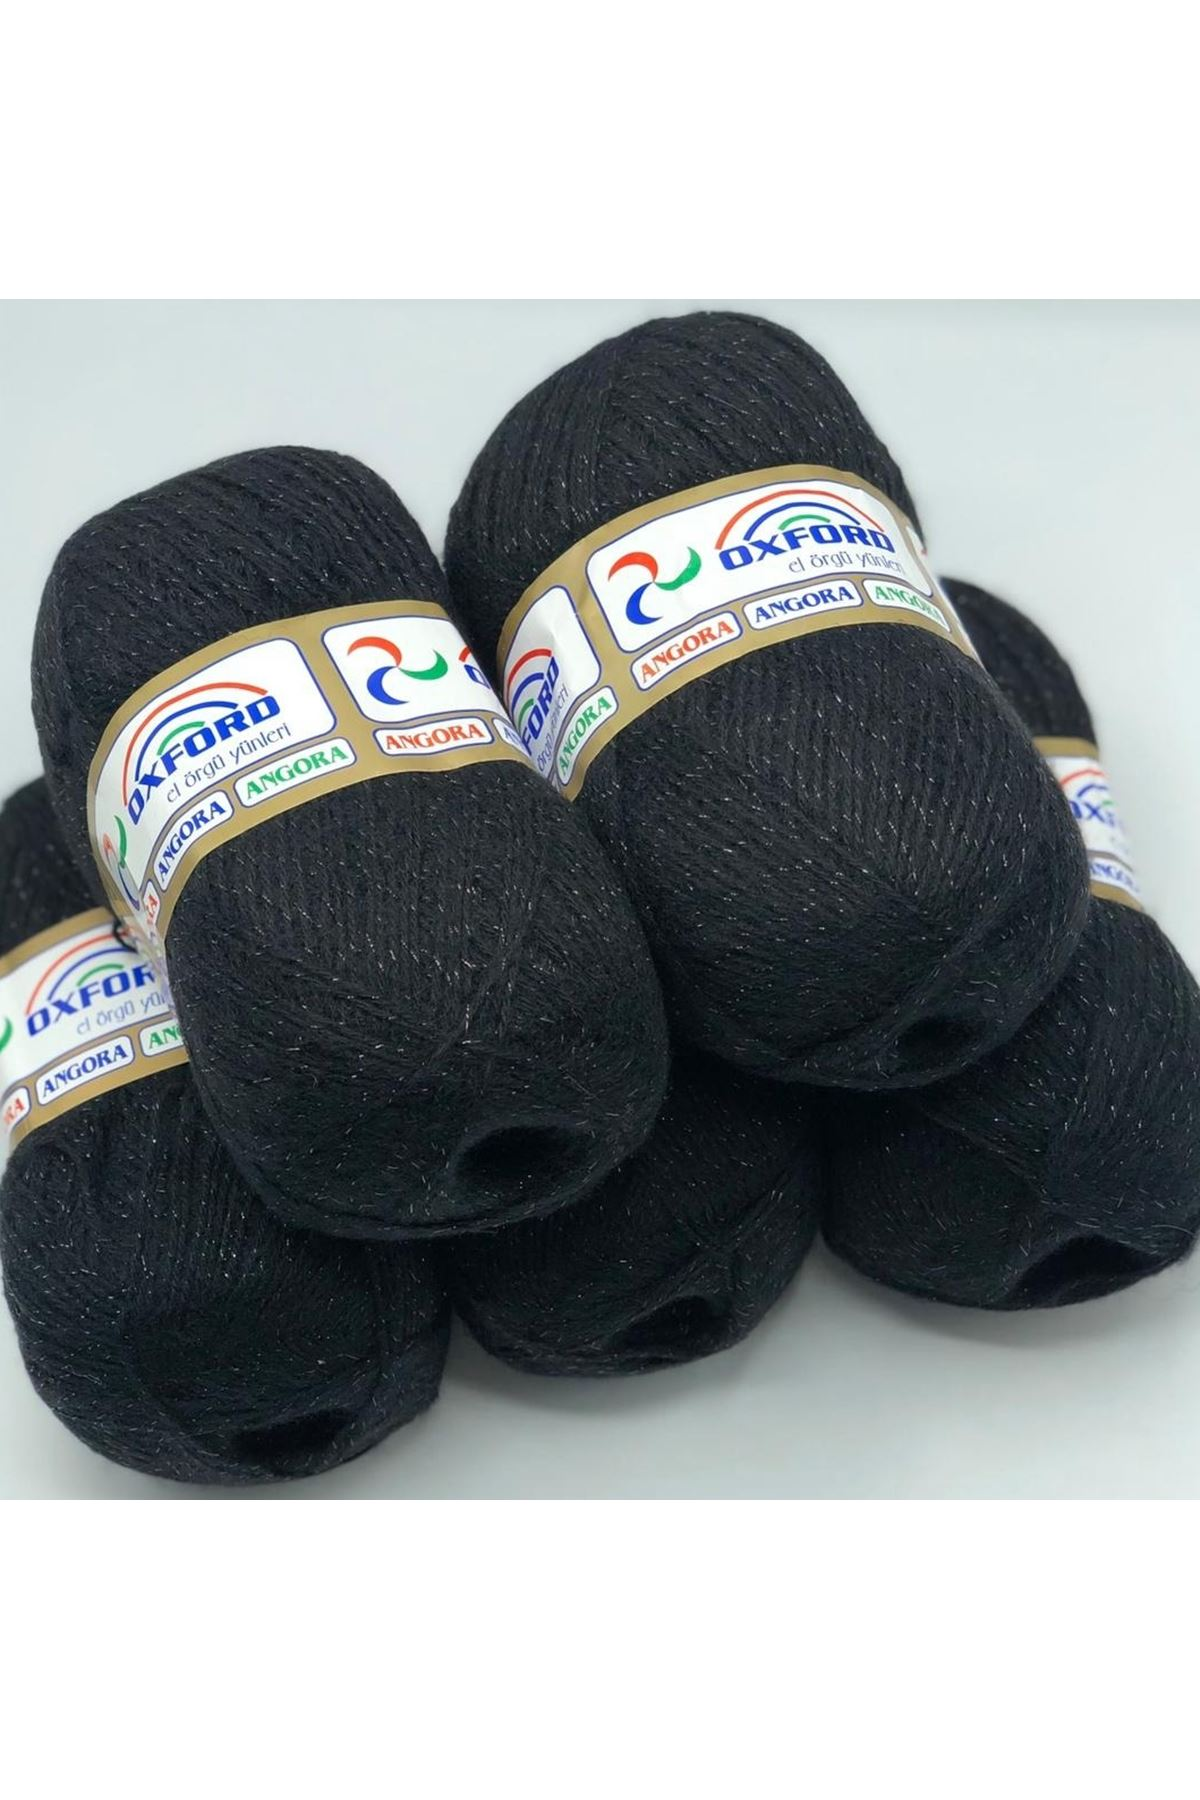 İhrac Fazlası 200 - 5'li Paket Simli Tiftik Siyah